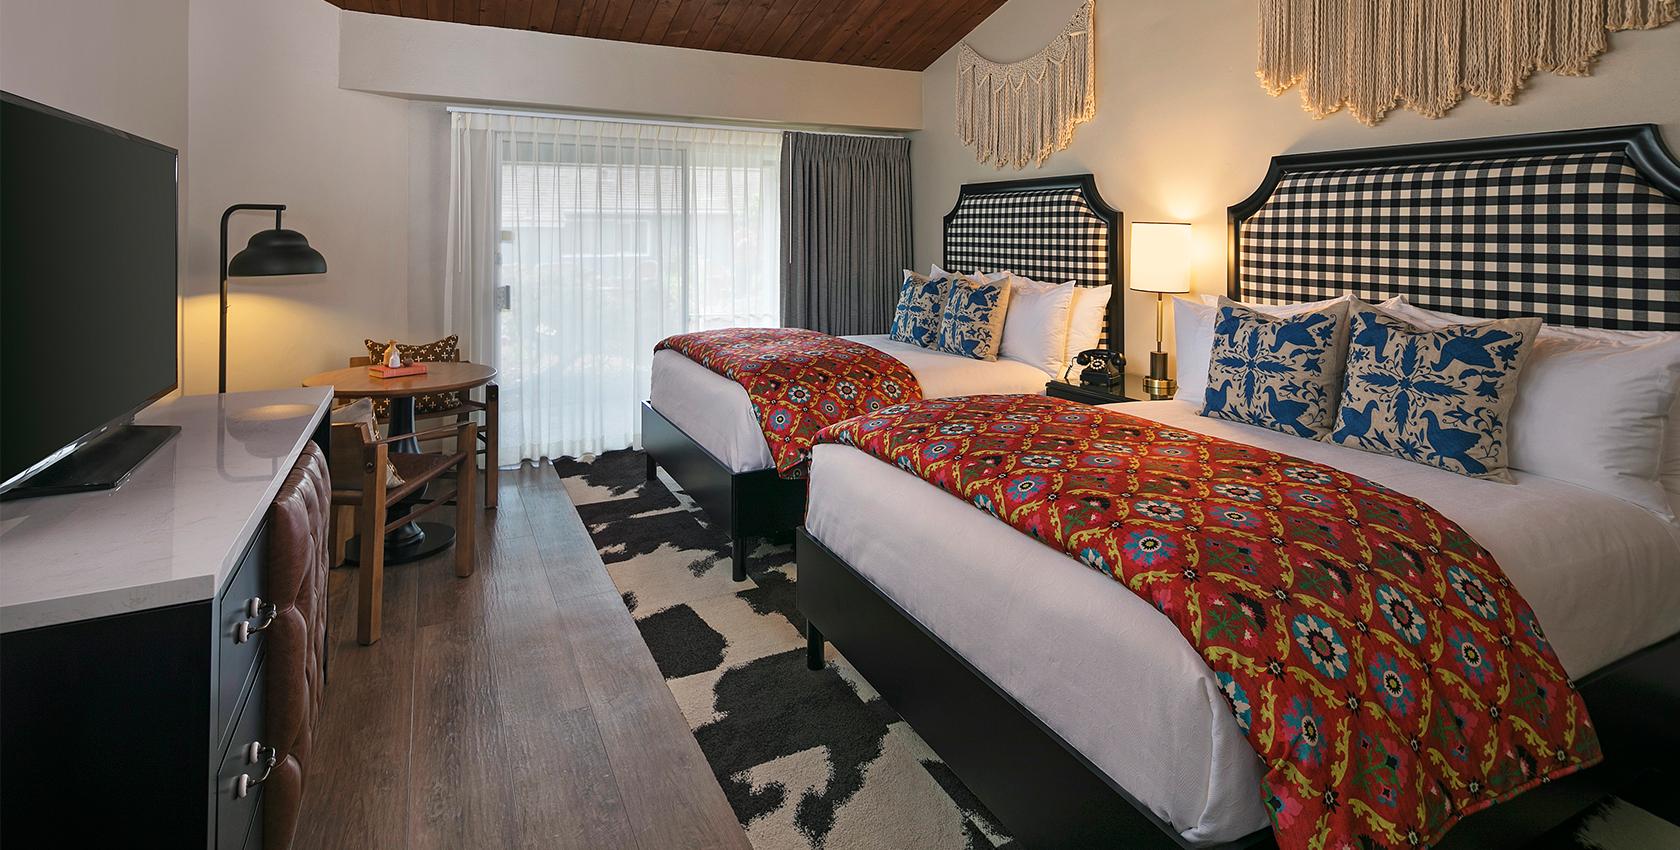 Ranch_hotel_in_cambria_ca.jpg